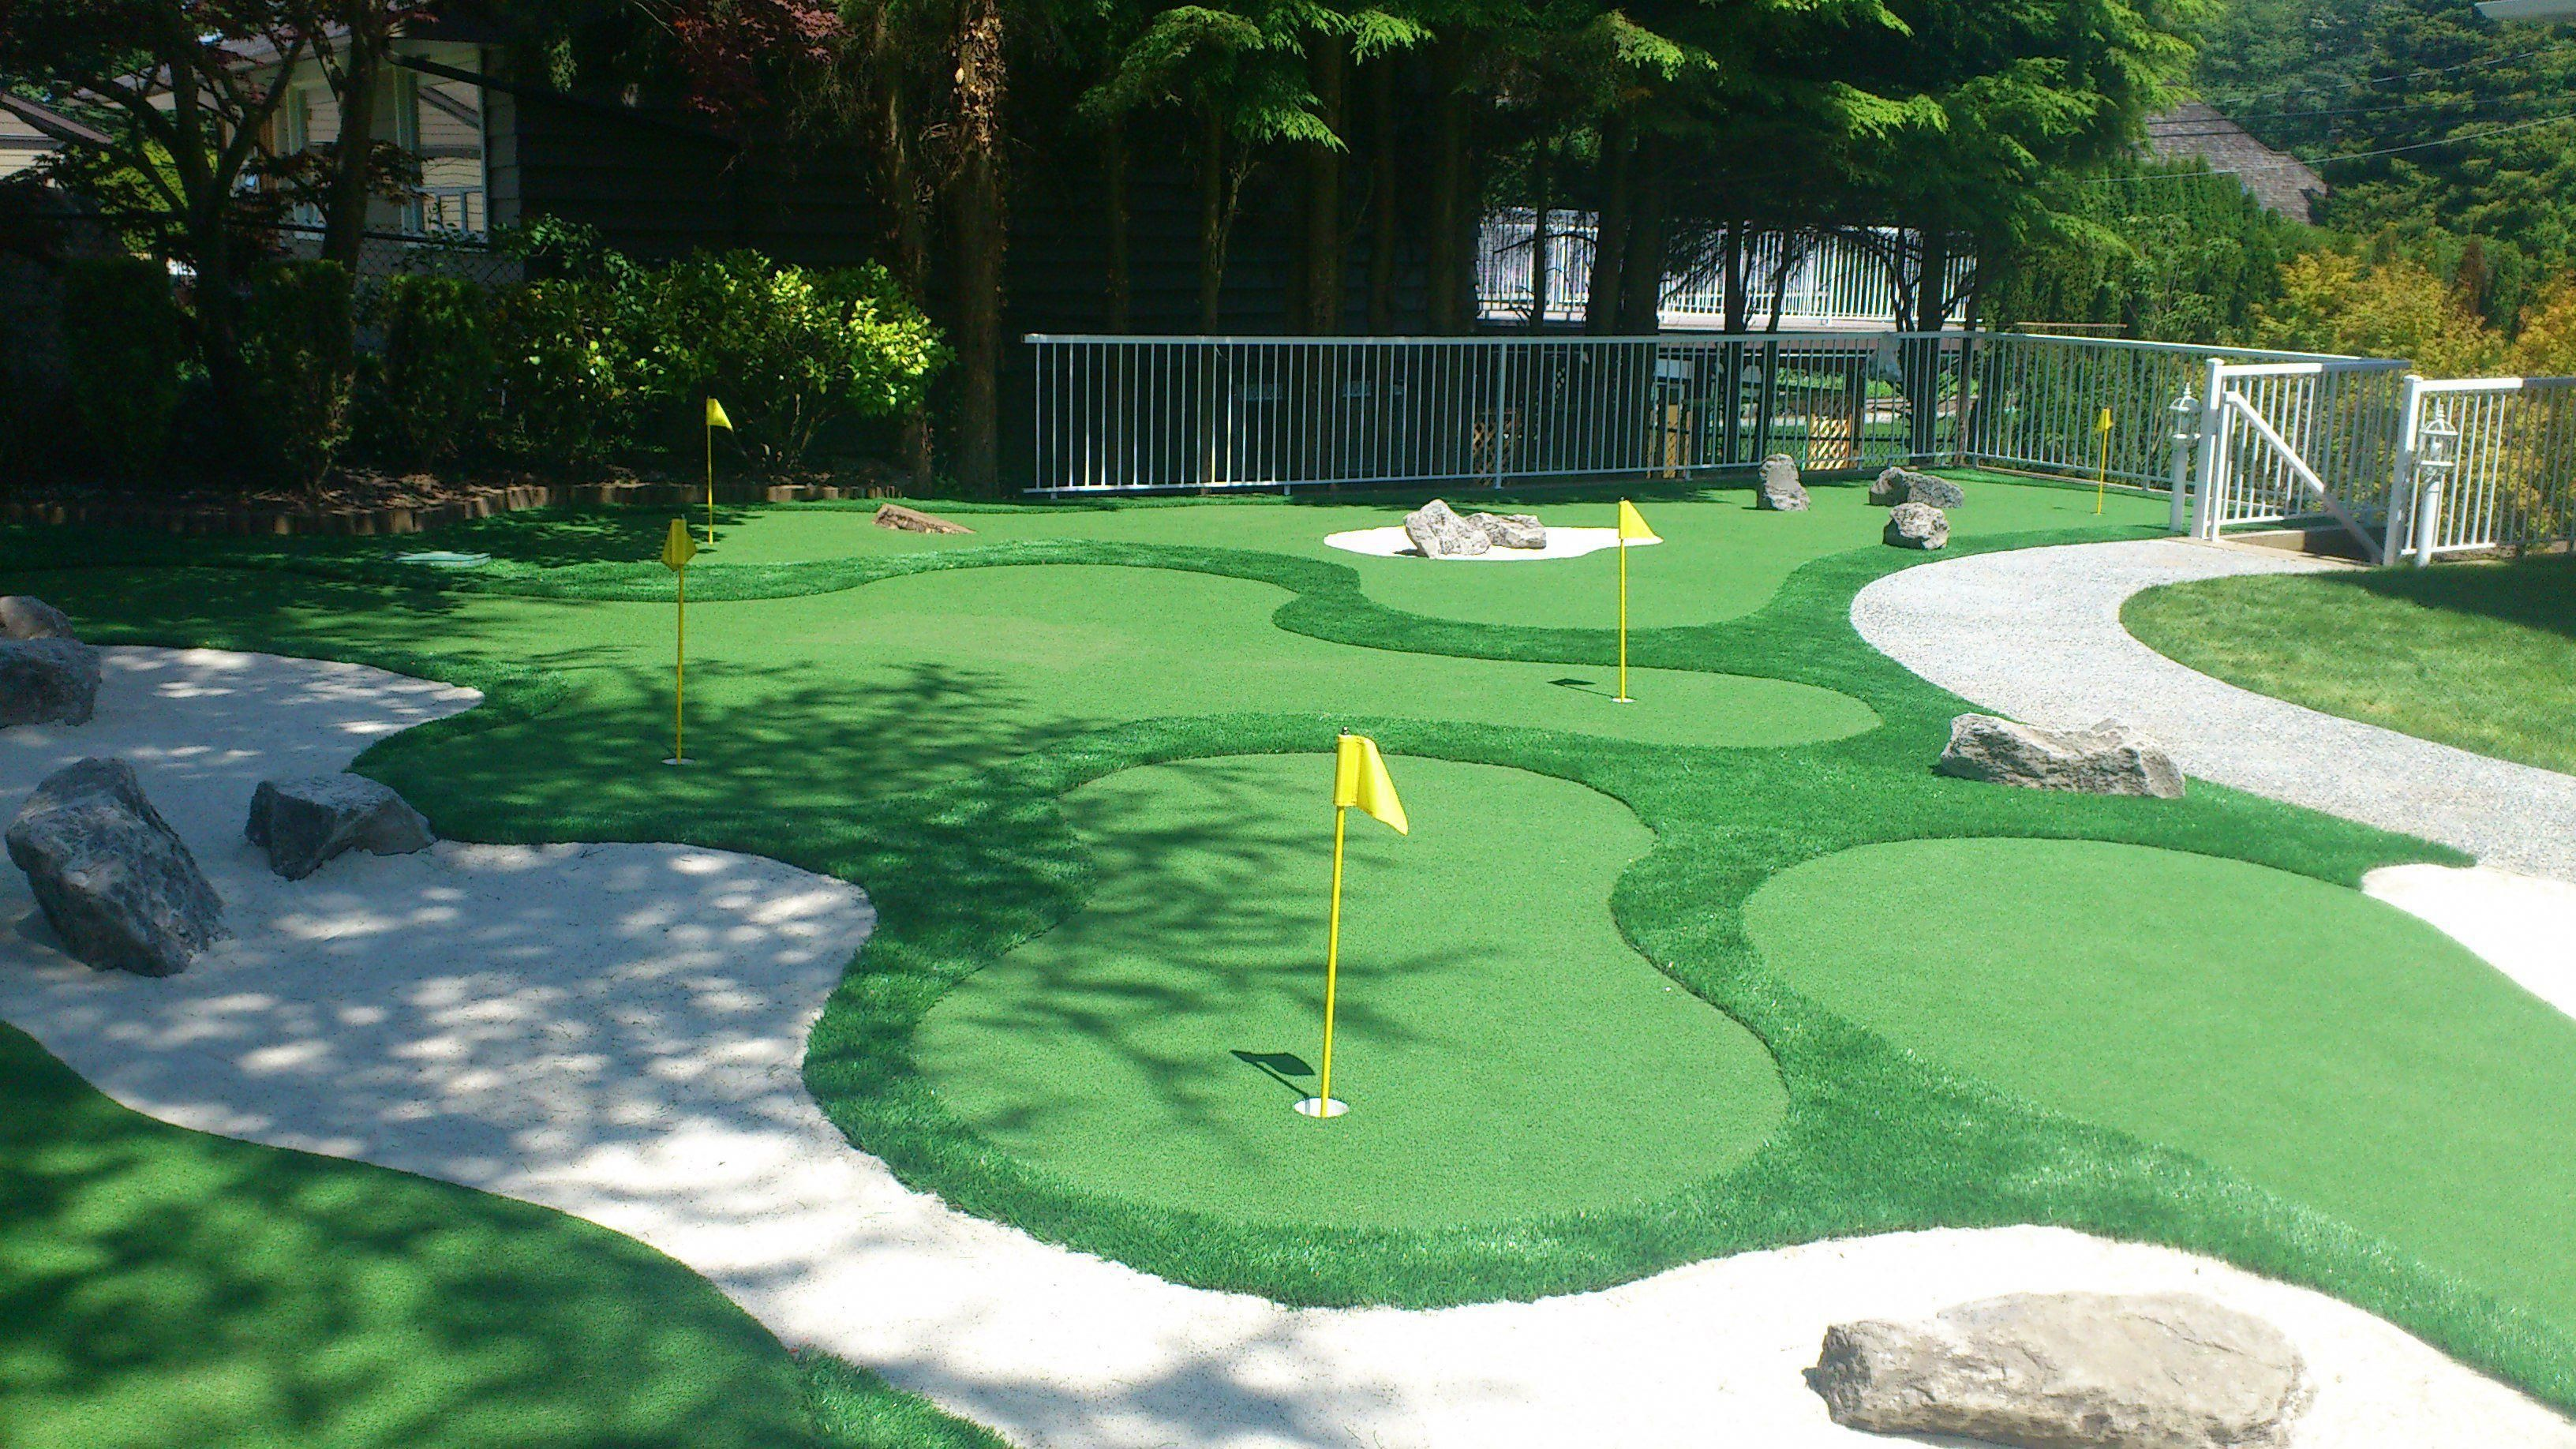 Hot Shots Golf 3 Tips #GolfGameTips #GolfInDubai